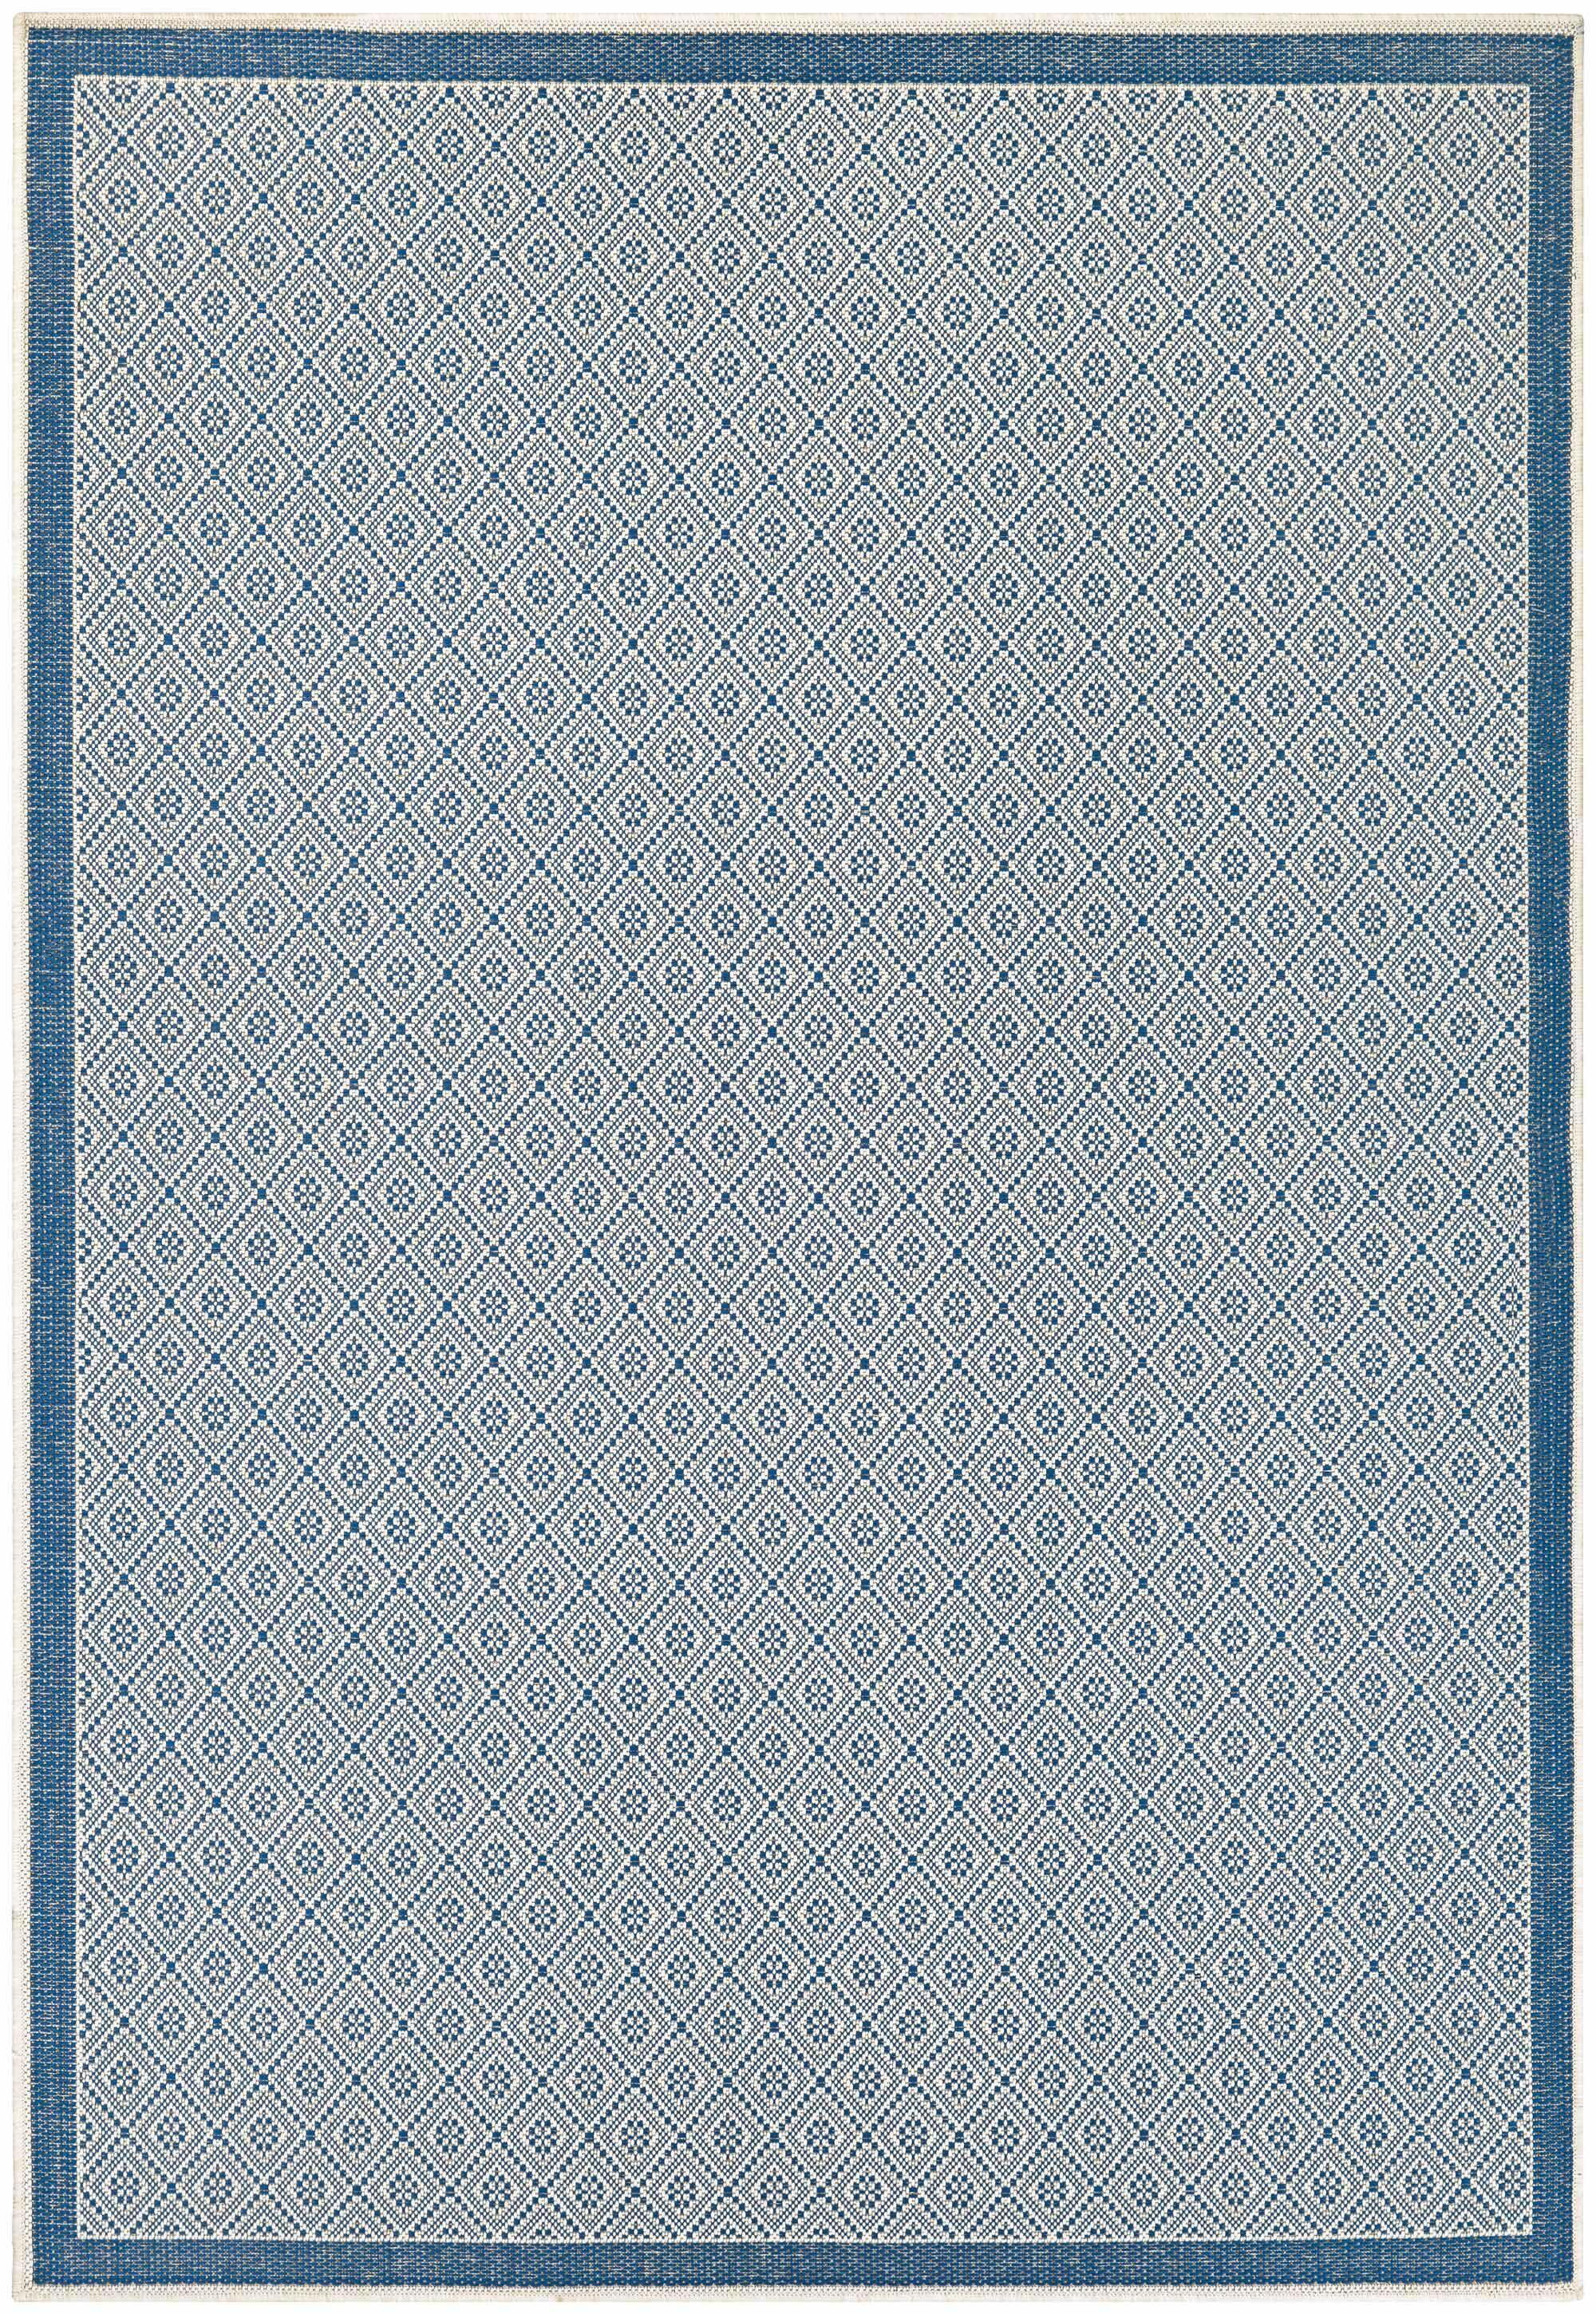 Wexford Blue Indoor/Outdoor Area Rug Rug Size: Rectangle 5'3